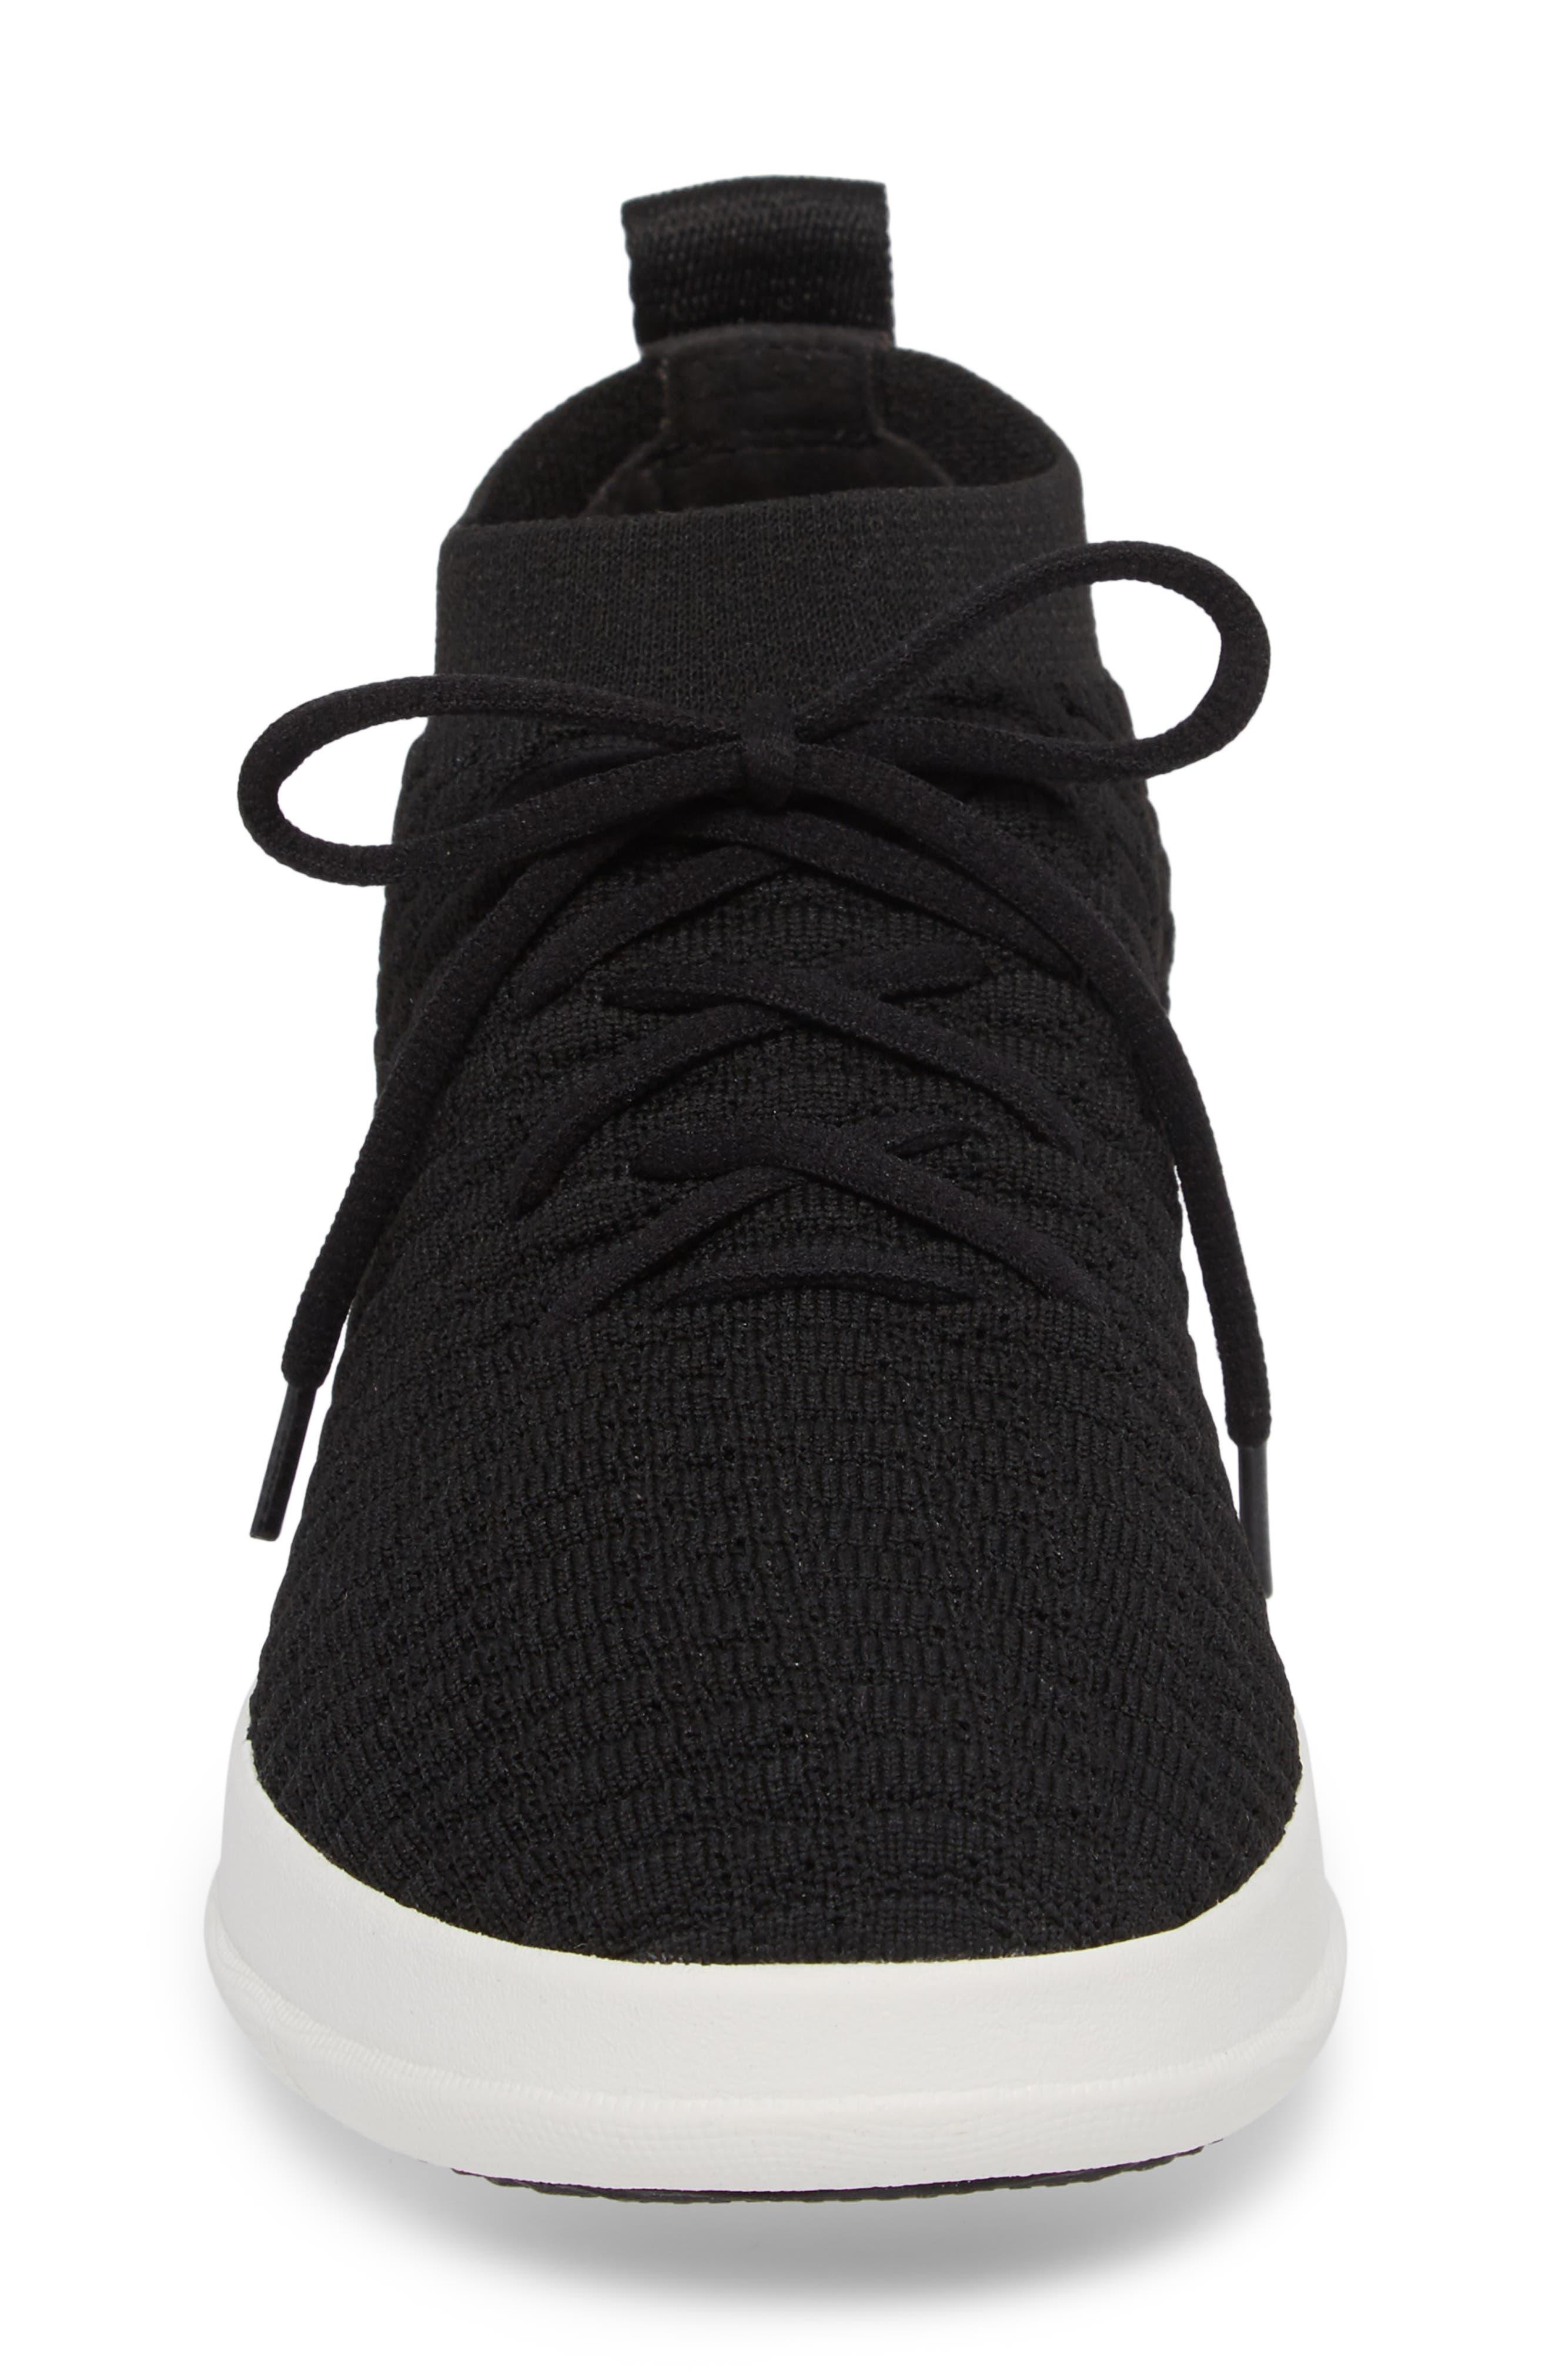 Uberknit<sup>™</sup> Slip-On High Top Sneaker,                             Alternate thumbnail 4, color,                             001